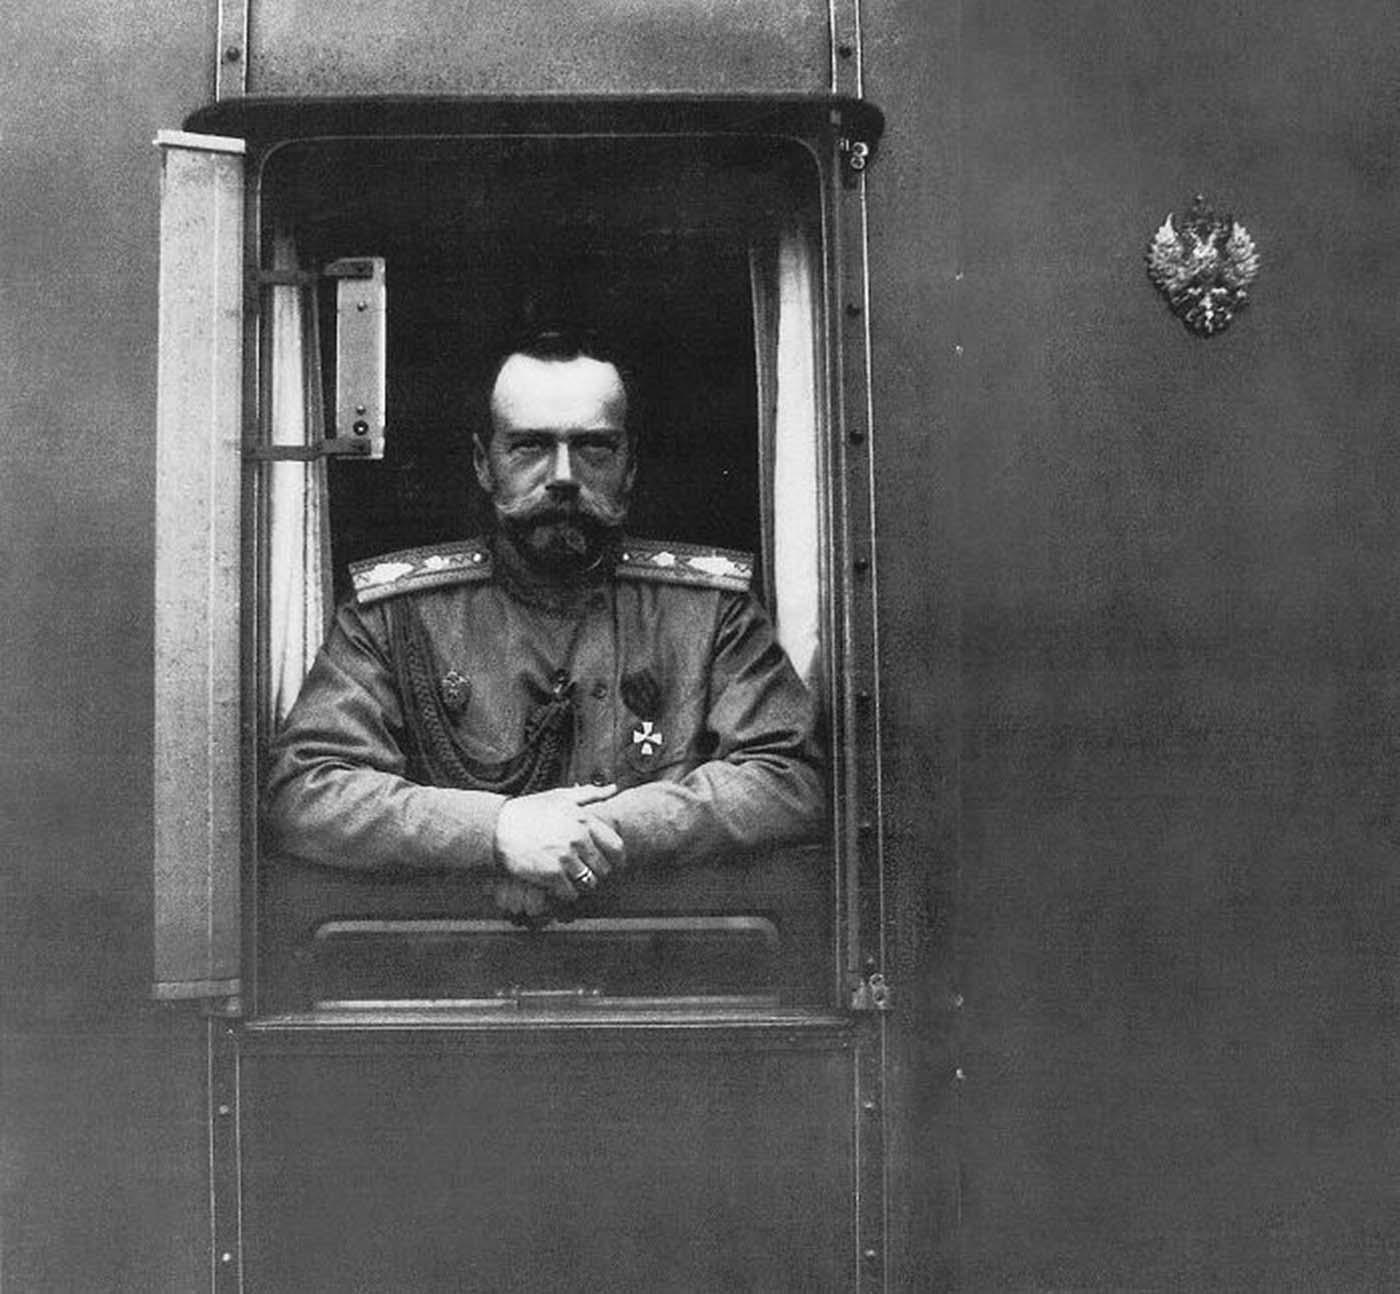 Emperor Nicholas II on board the Imperial Train